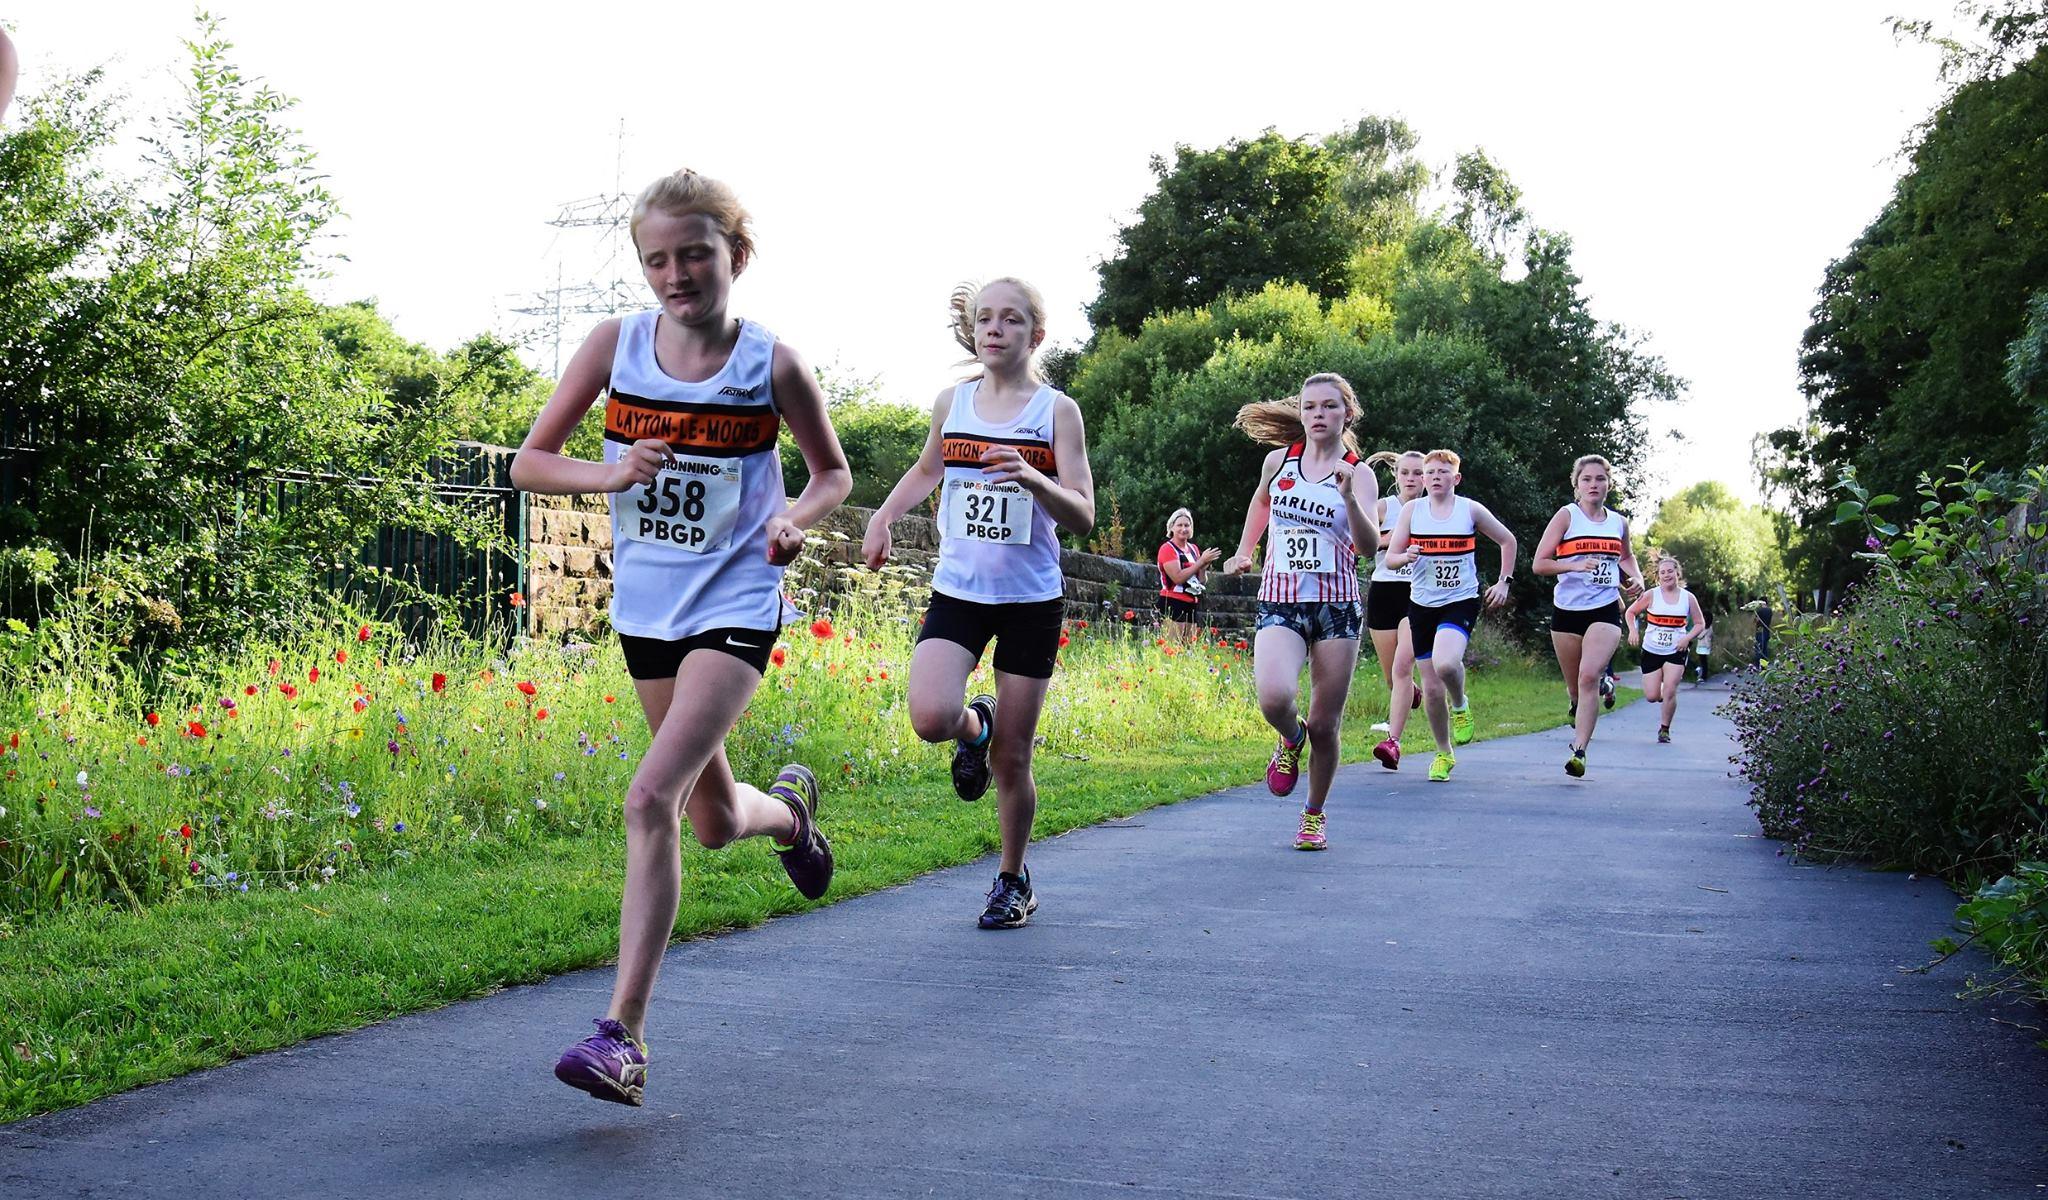 Beth Wheatcroft and Kaliska in the U15G race. Photo: David Belshaw